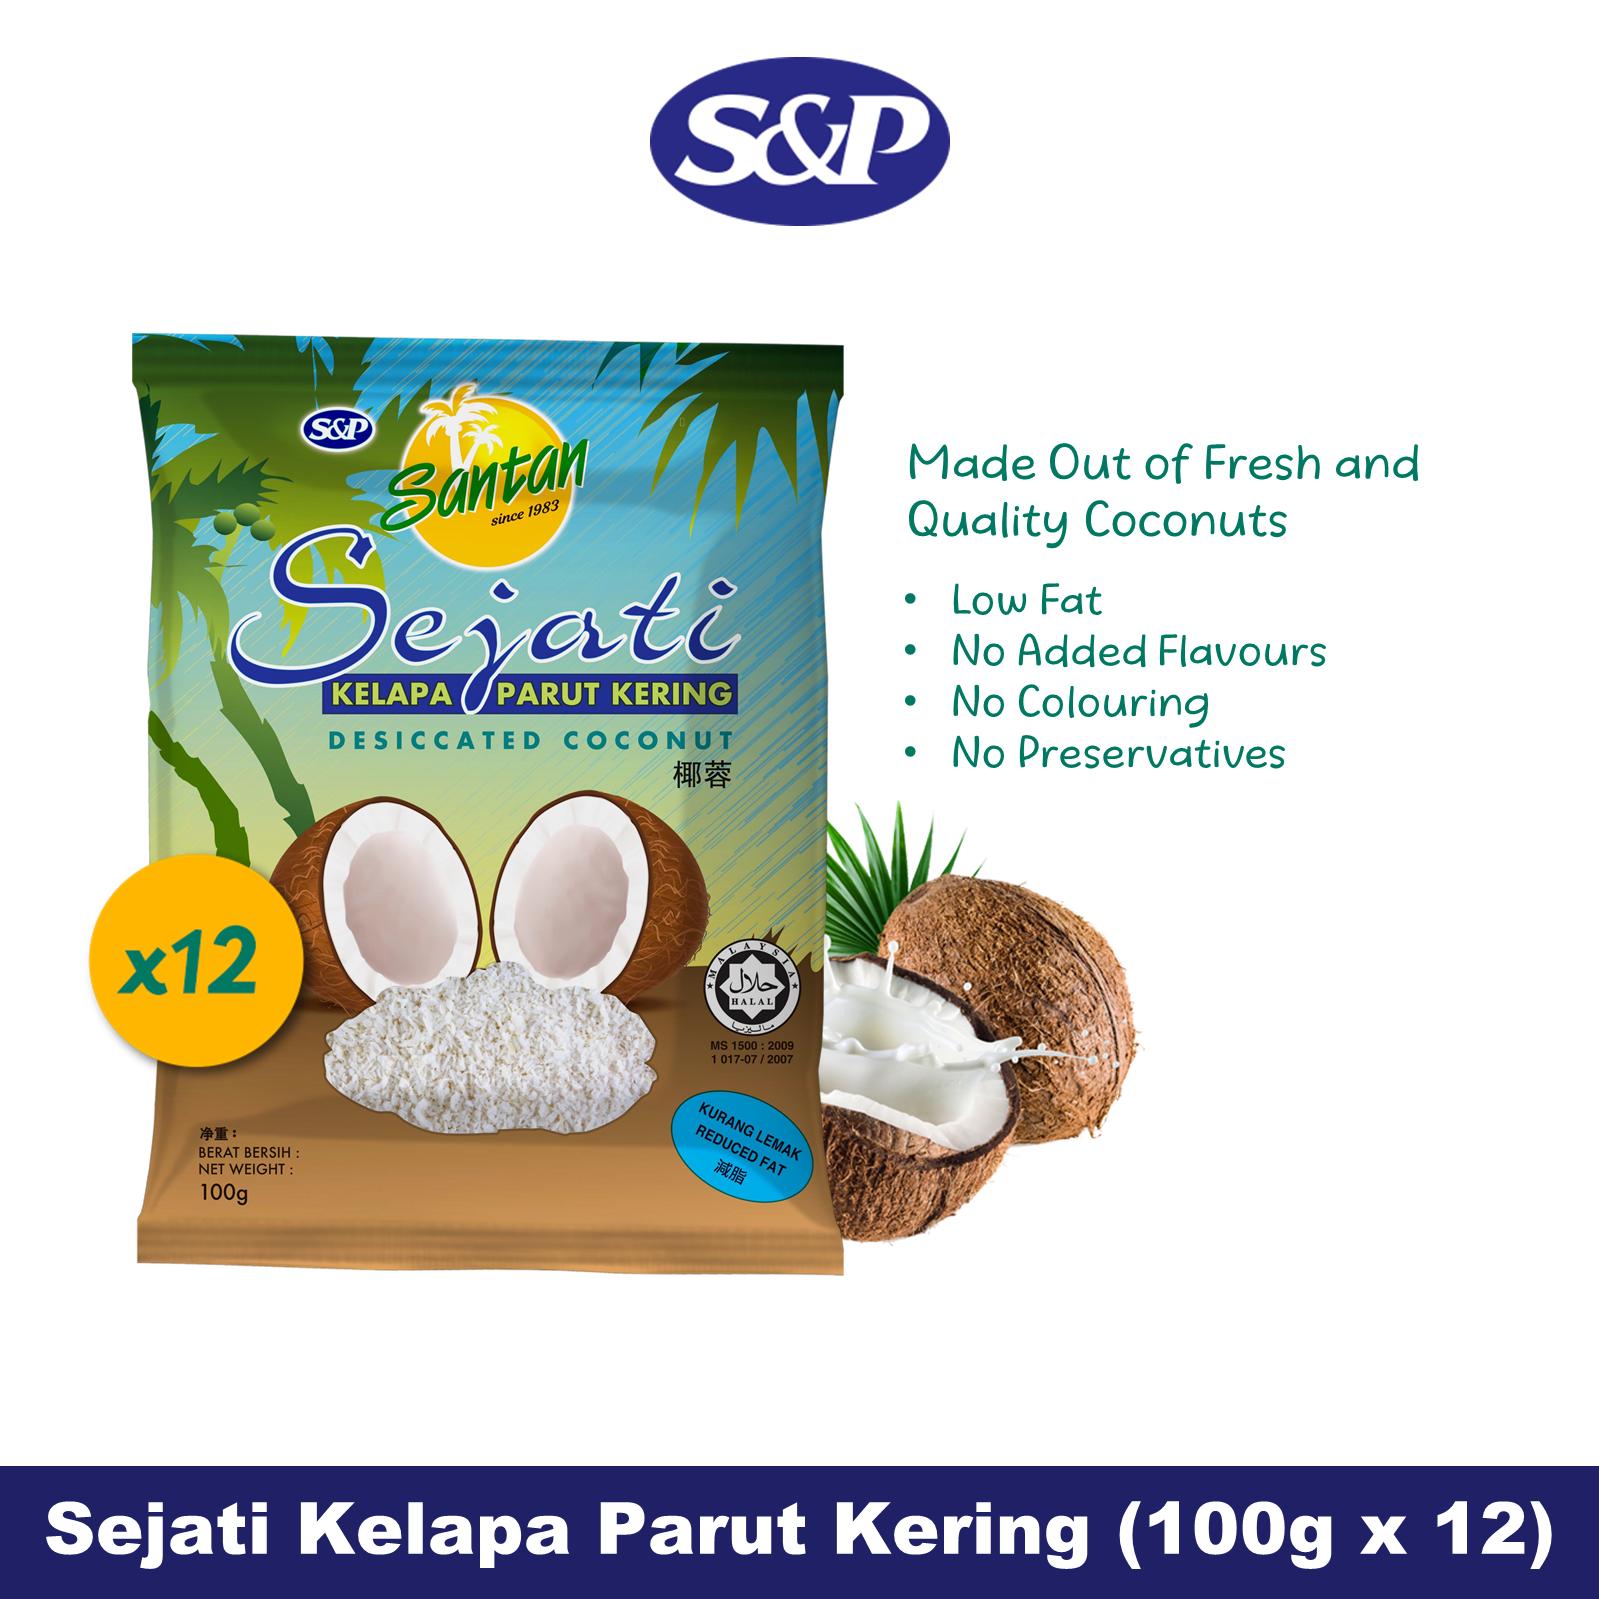 S&P Santan Sejati Desiccated Coconut Kelapa Parut Kering (100g x12)